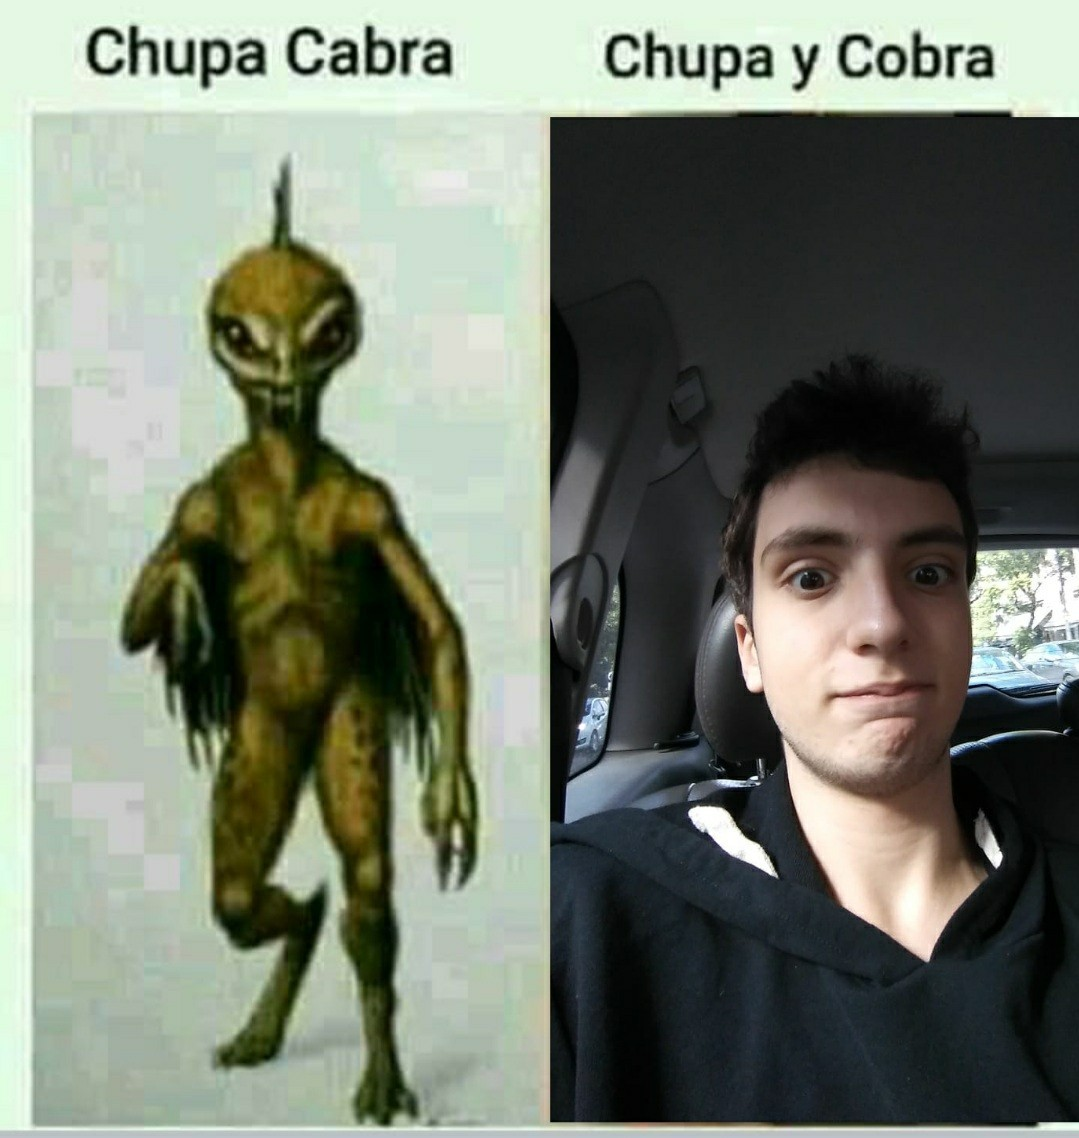 Chupa y Cobra - meme